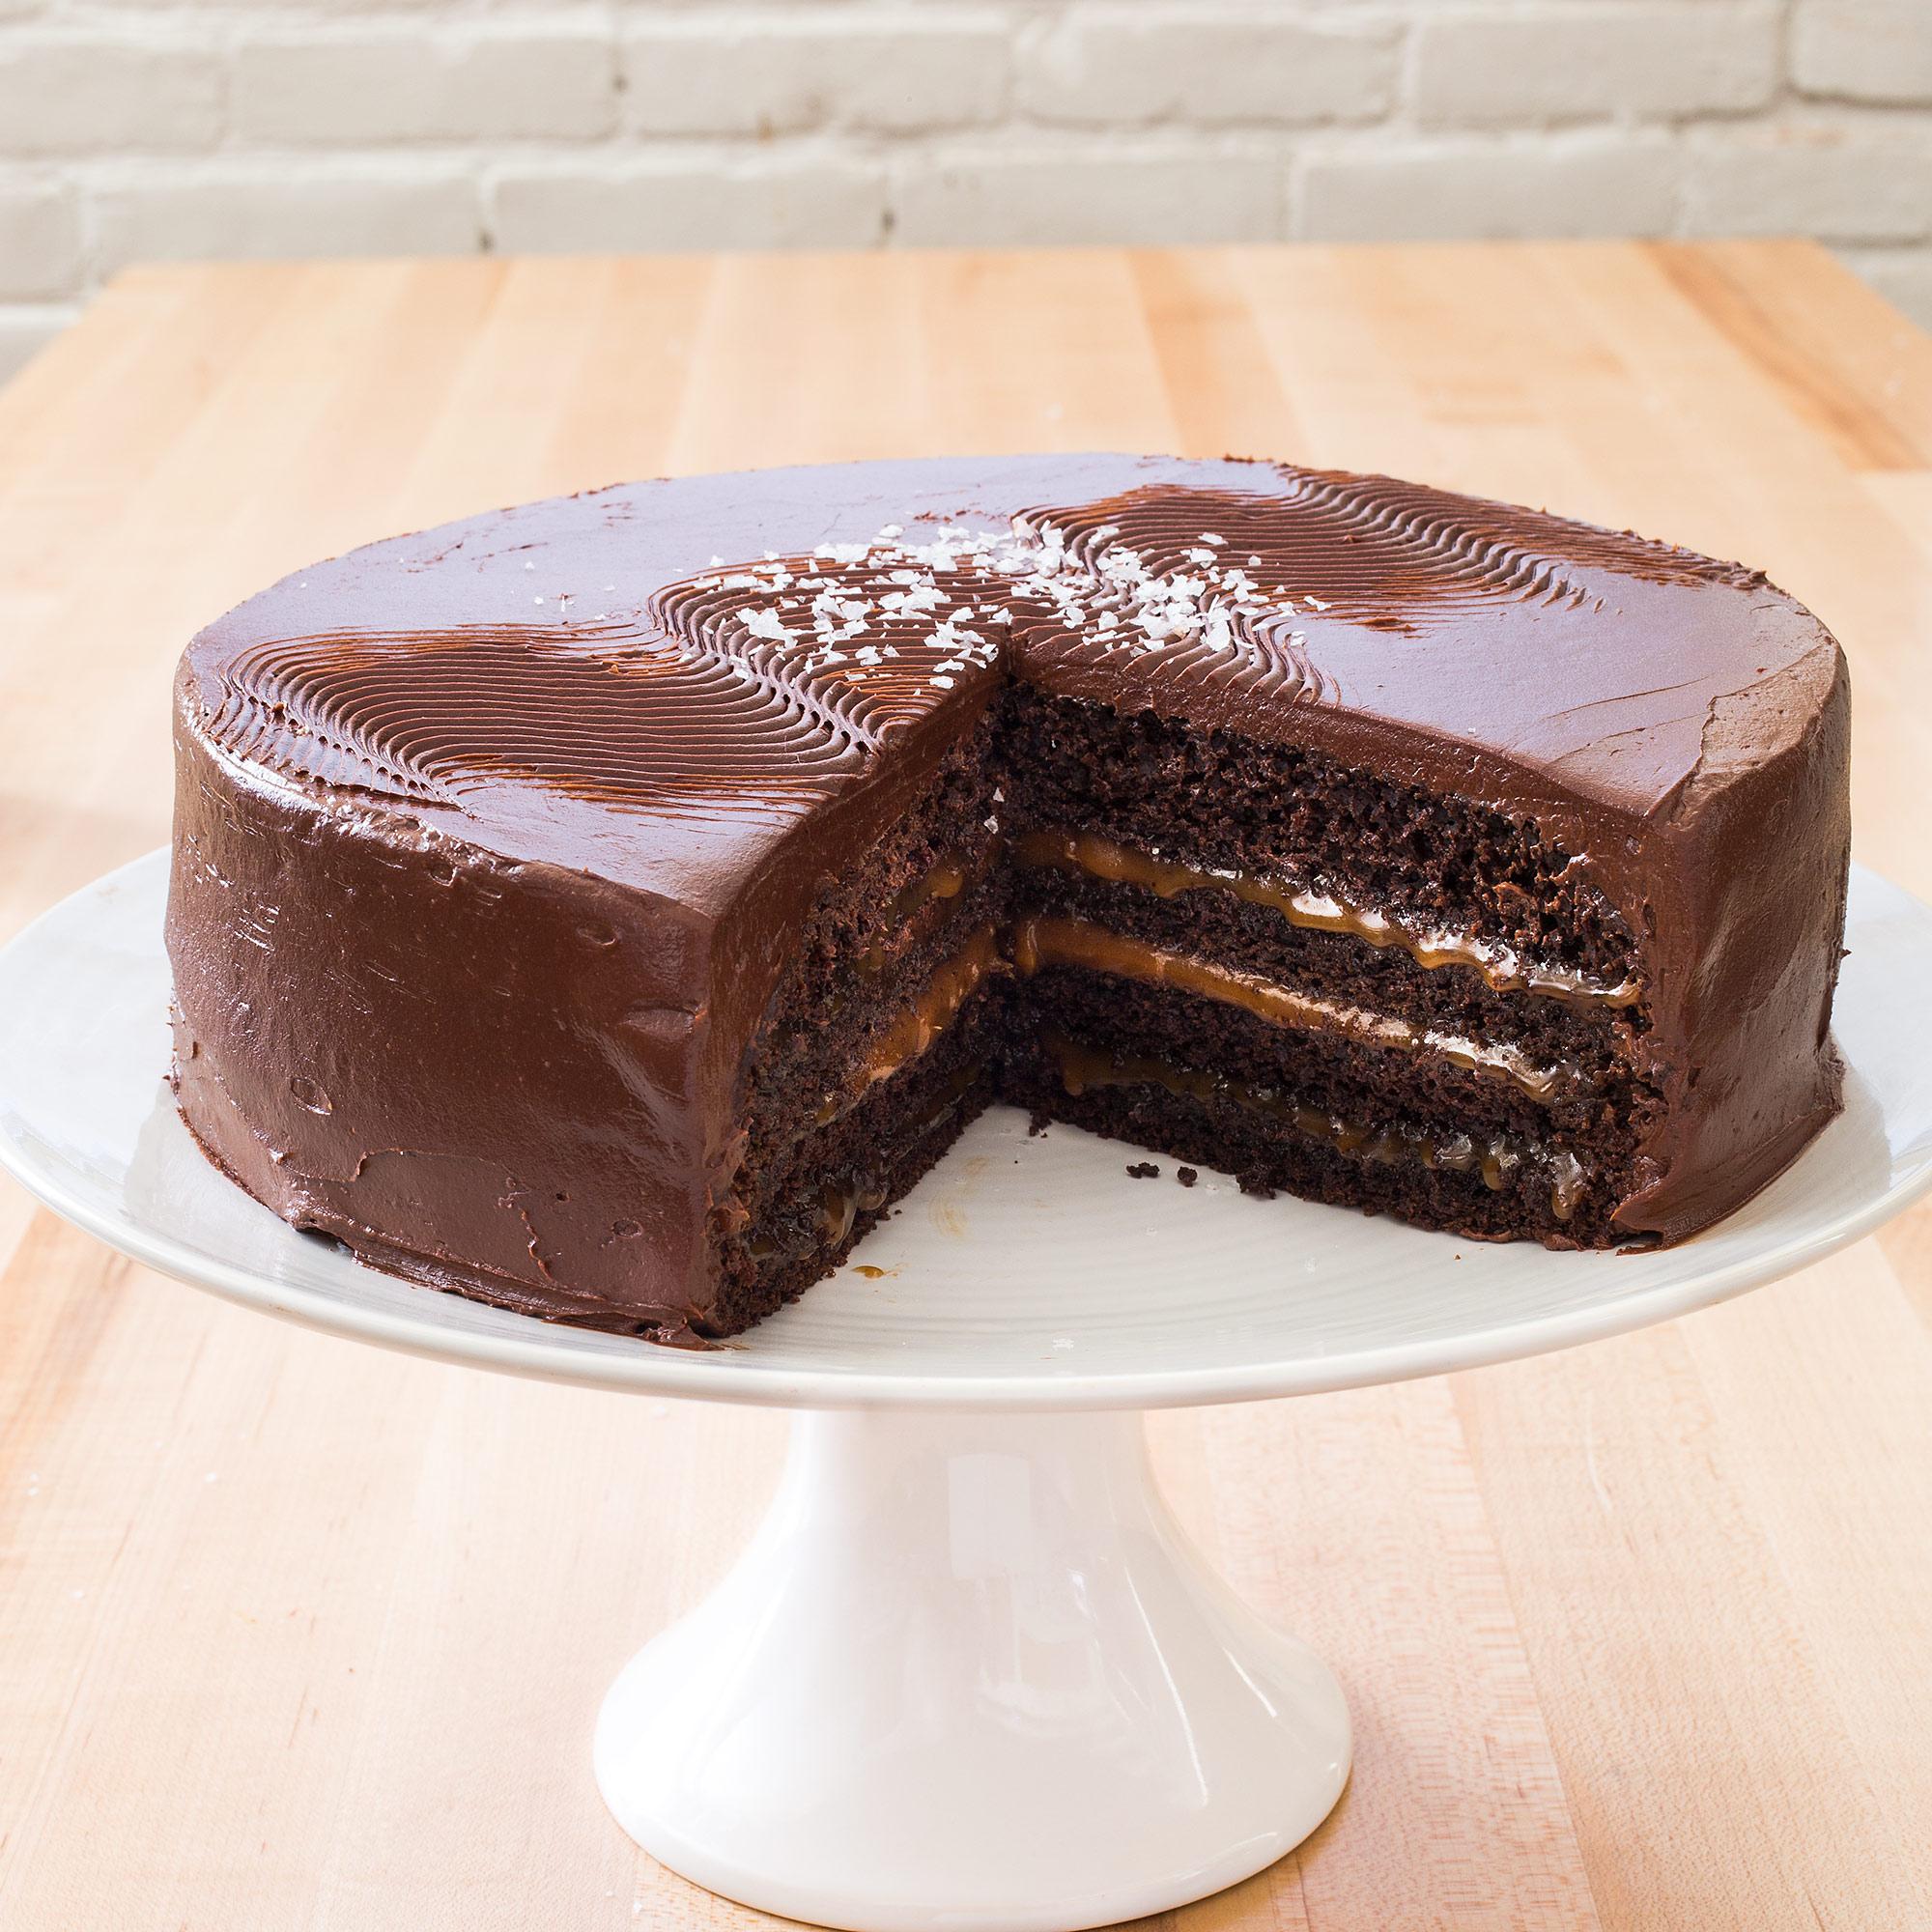 SFS_chocolate_caramel_layer_cake-28.jpg